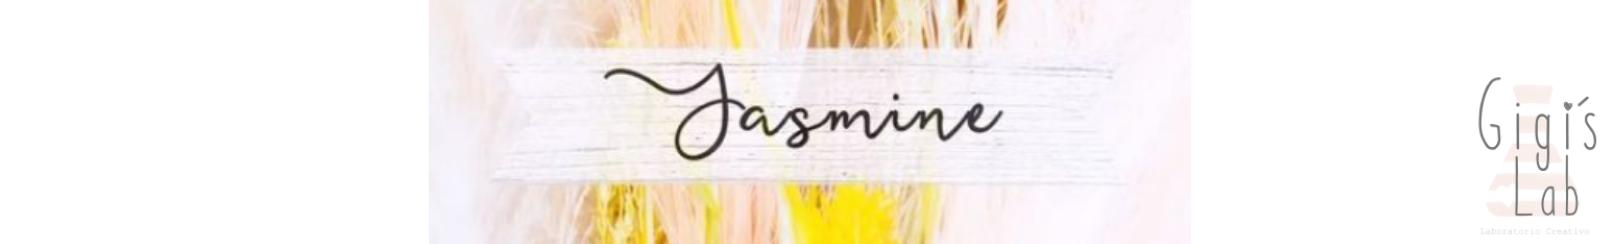 jasmine-gigislab